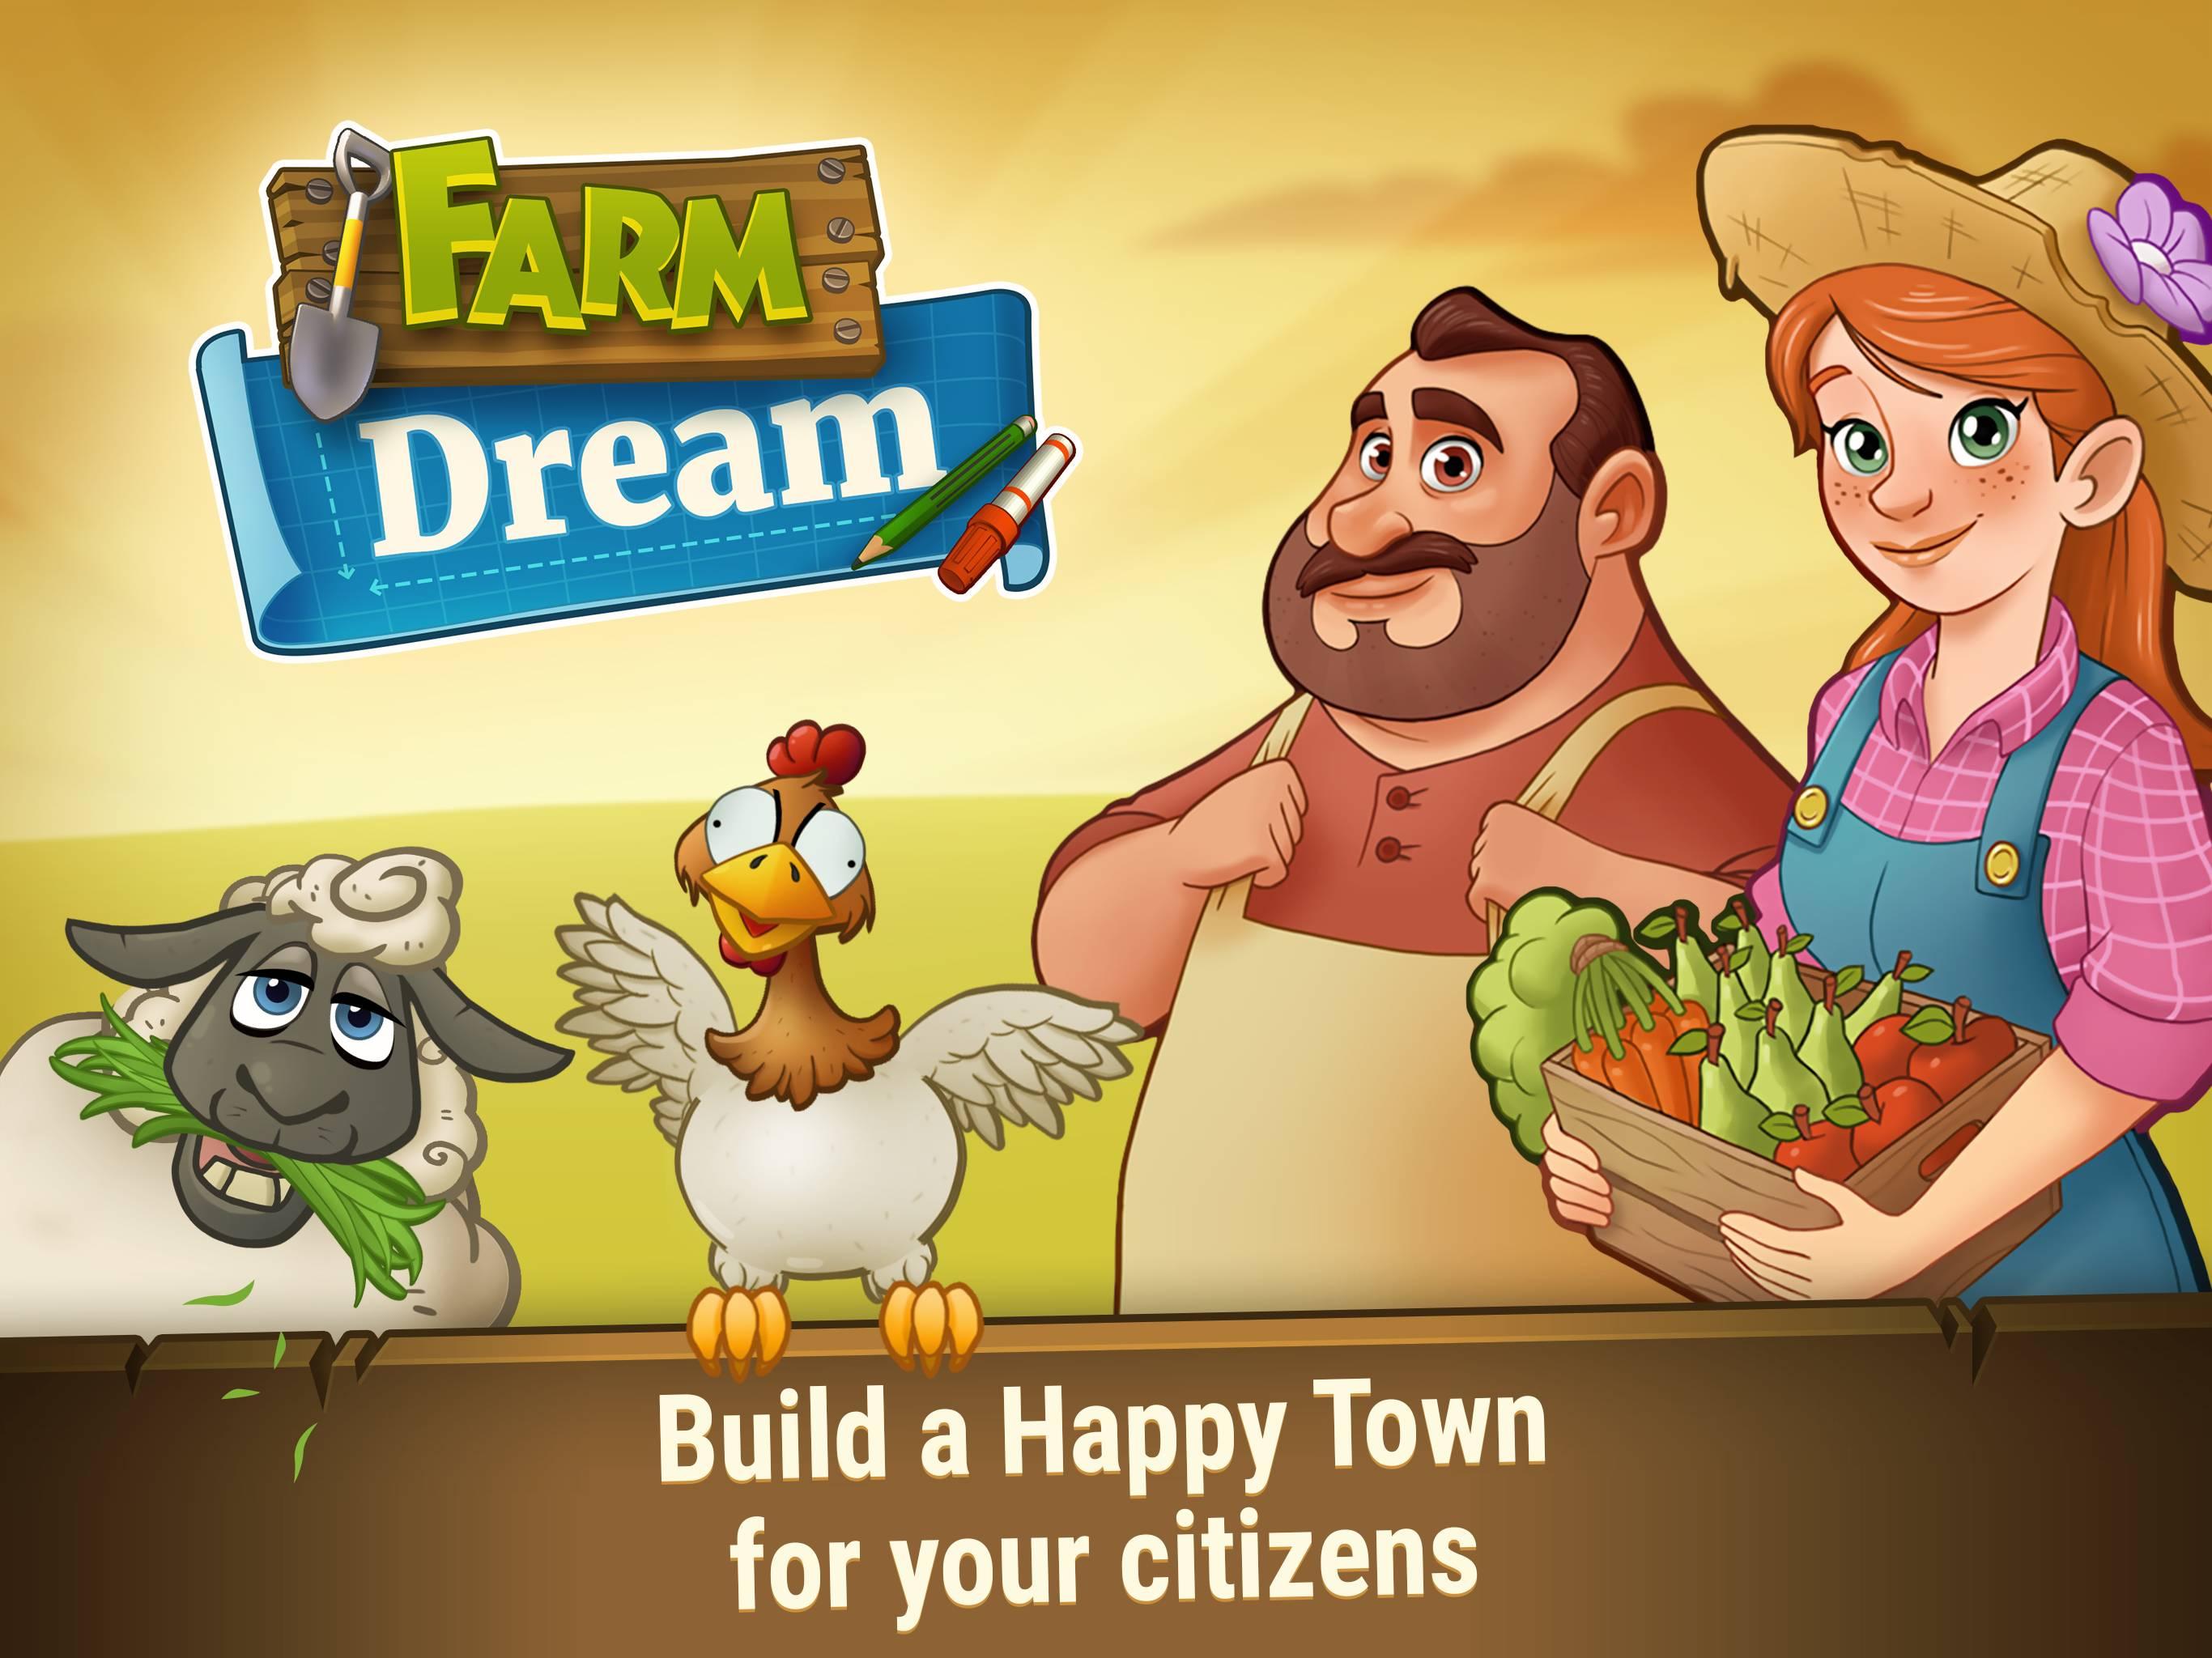 Farm Dream: Harvest your Town on Farming Day